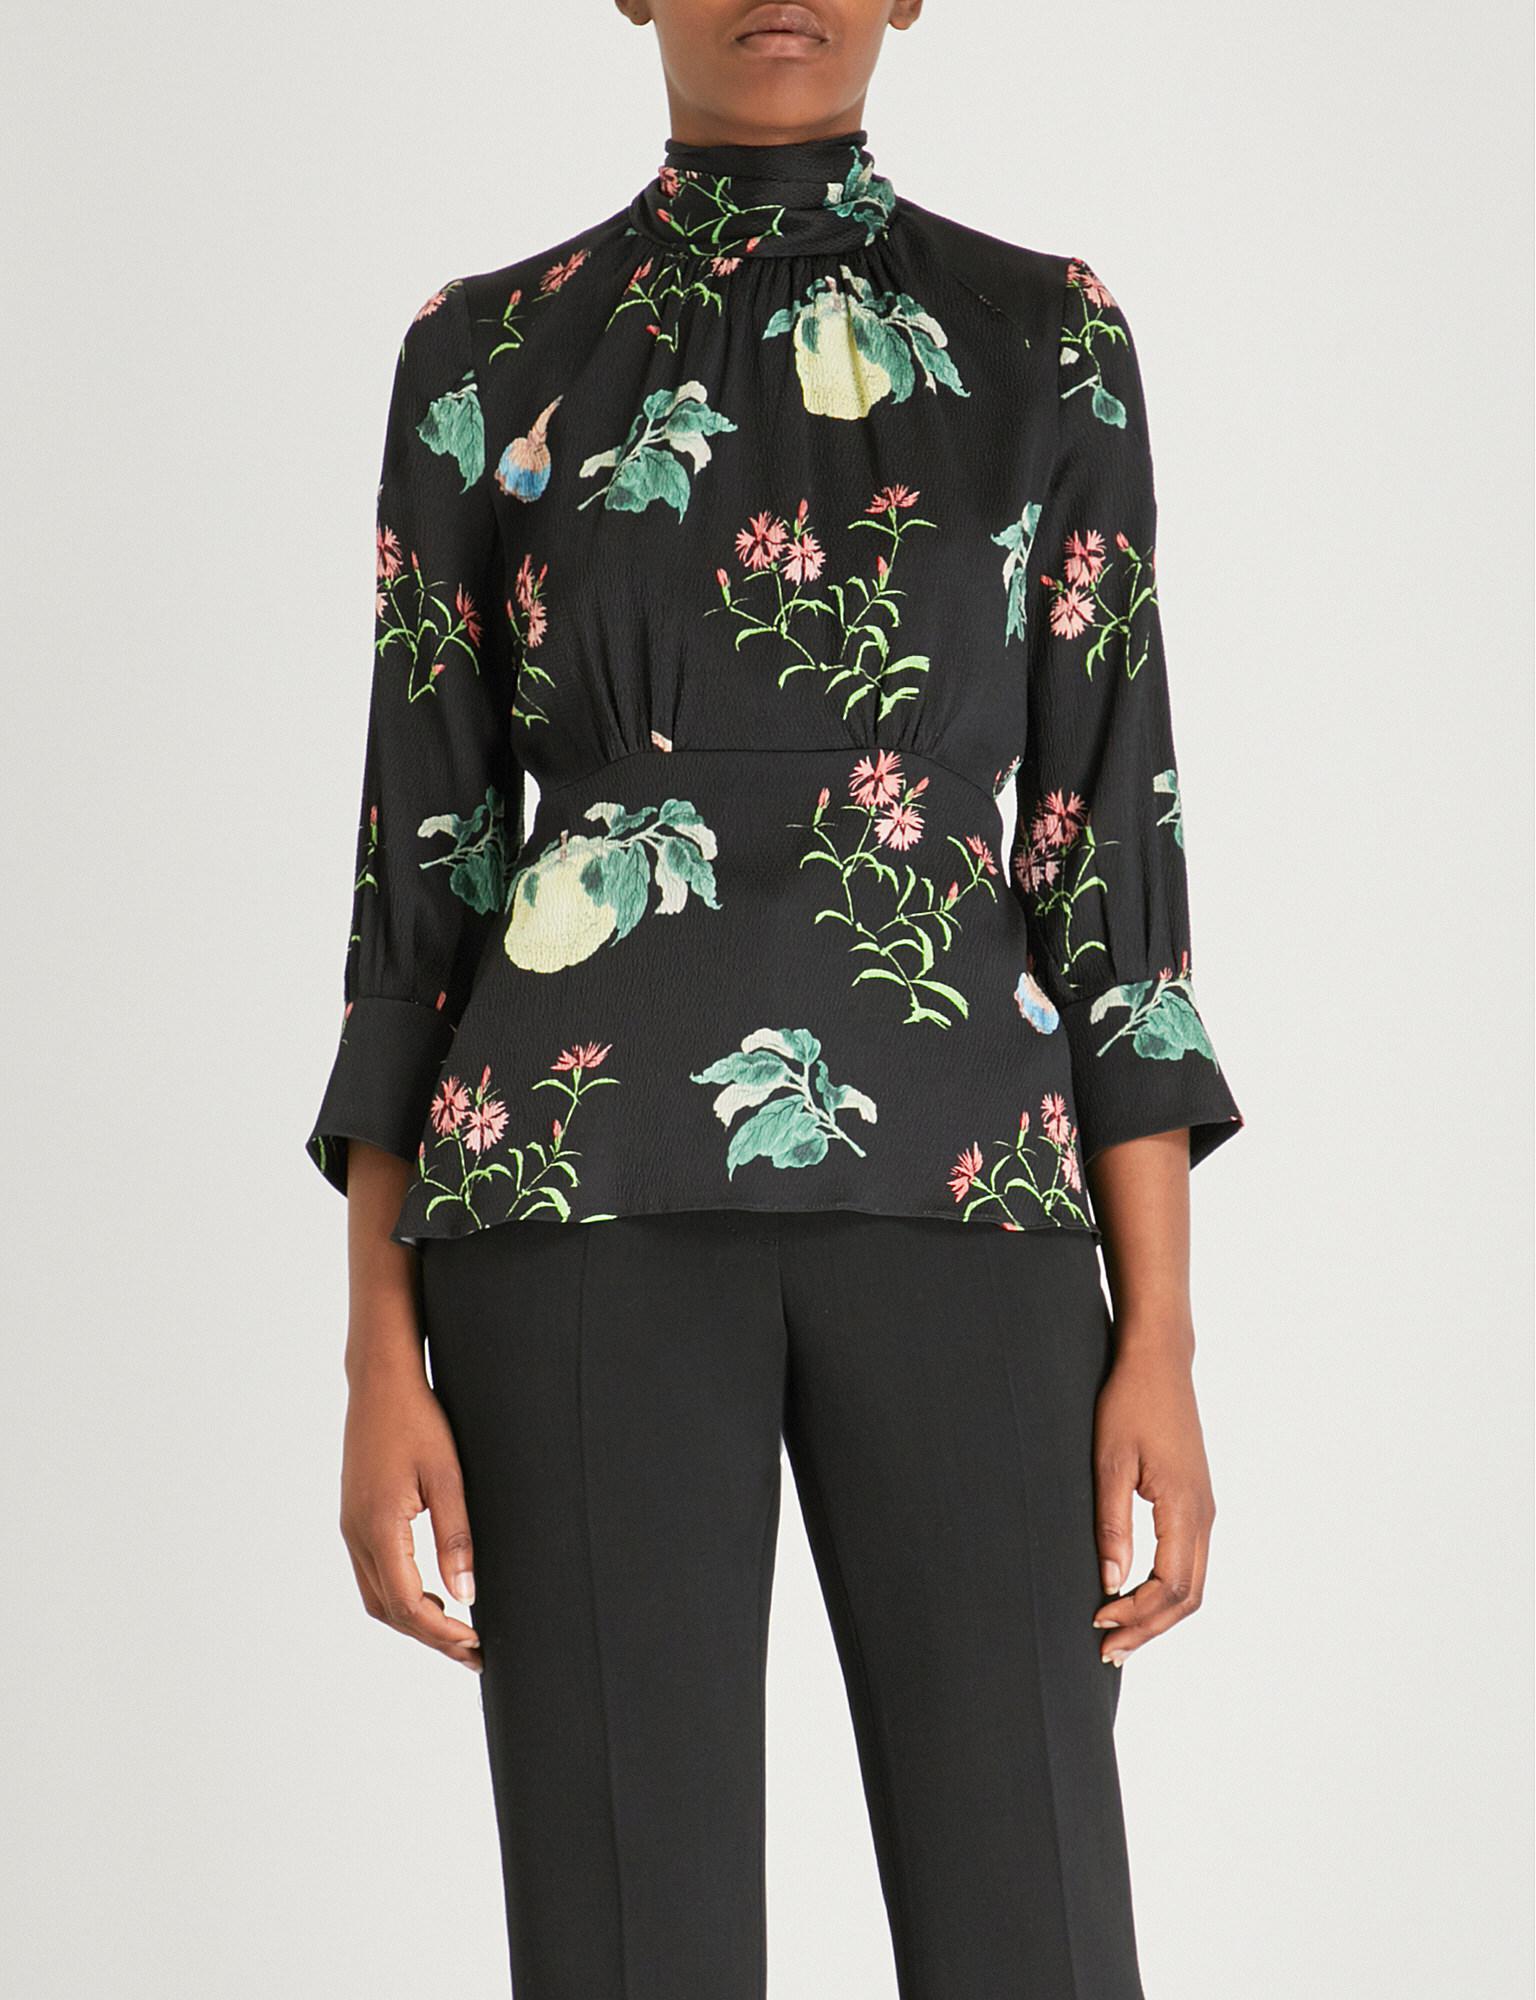 b934cf8a346c4 Lyst - Peter Pilotto Ladies Black Floral-print High-neck Silk Top in ...